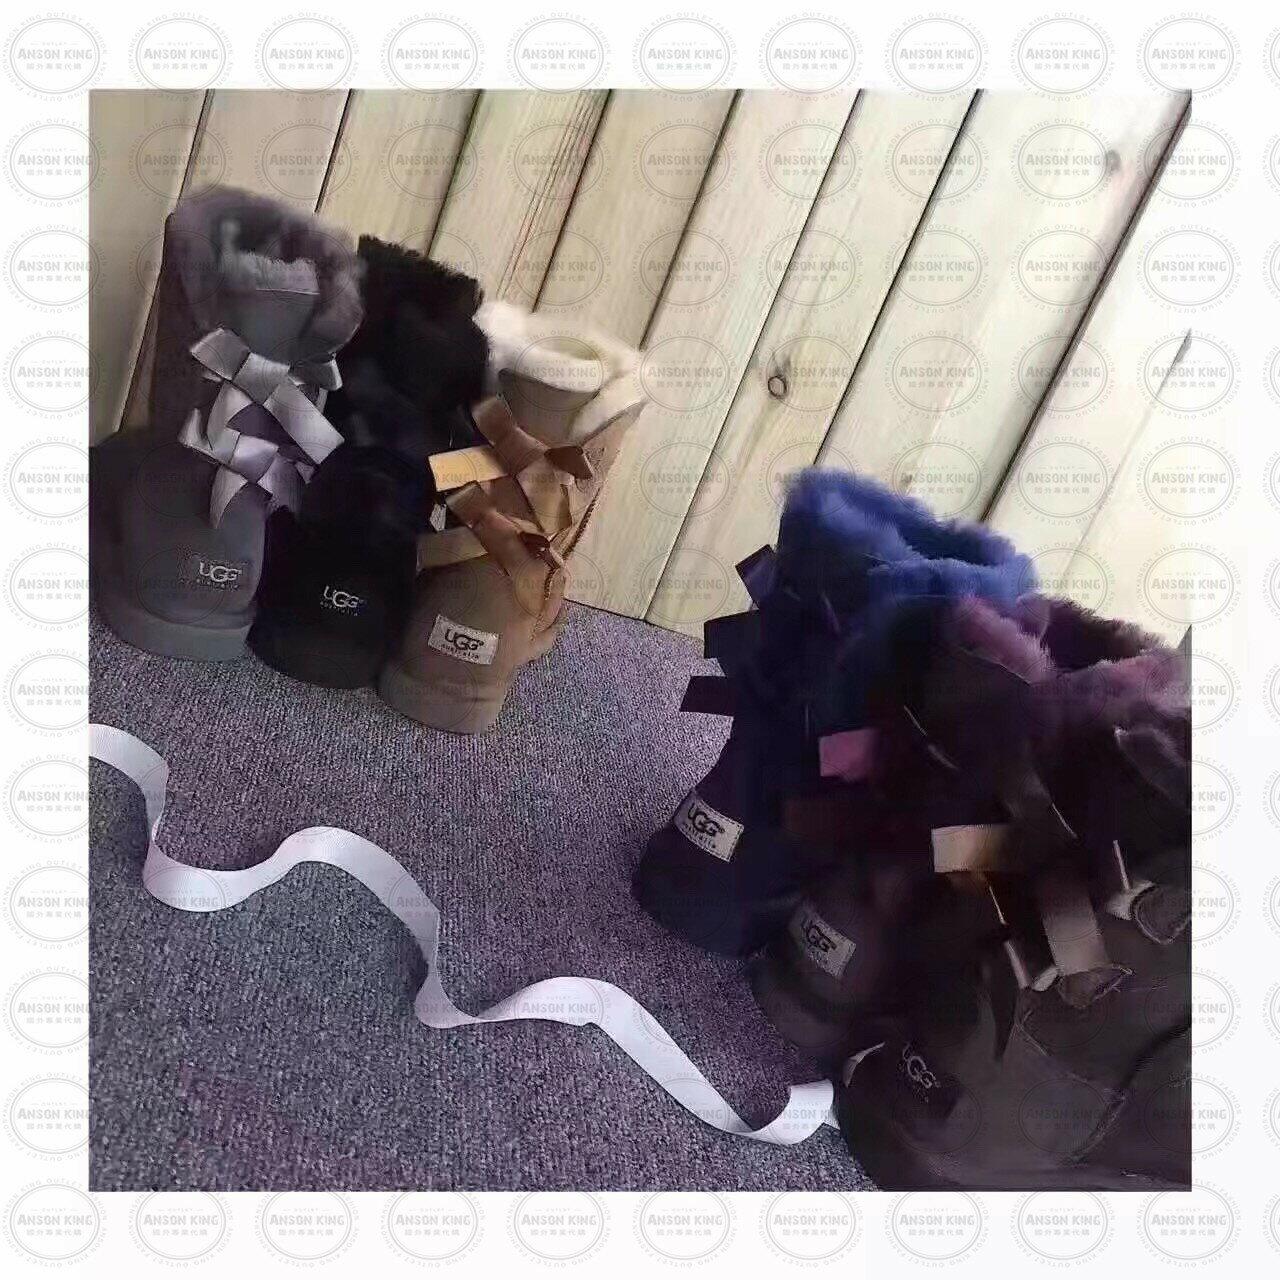 OUTLET正品代購 澳洲 UGG 蝴蝶結3280羊皮毛一體 中長靴 保暖 真皮羊皮毛 雪靴 短靴 藍色 2